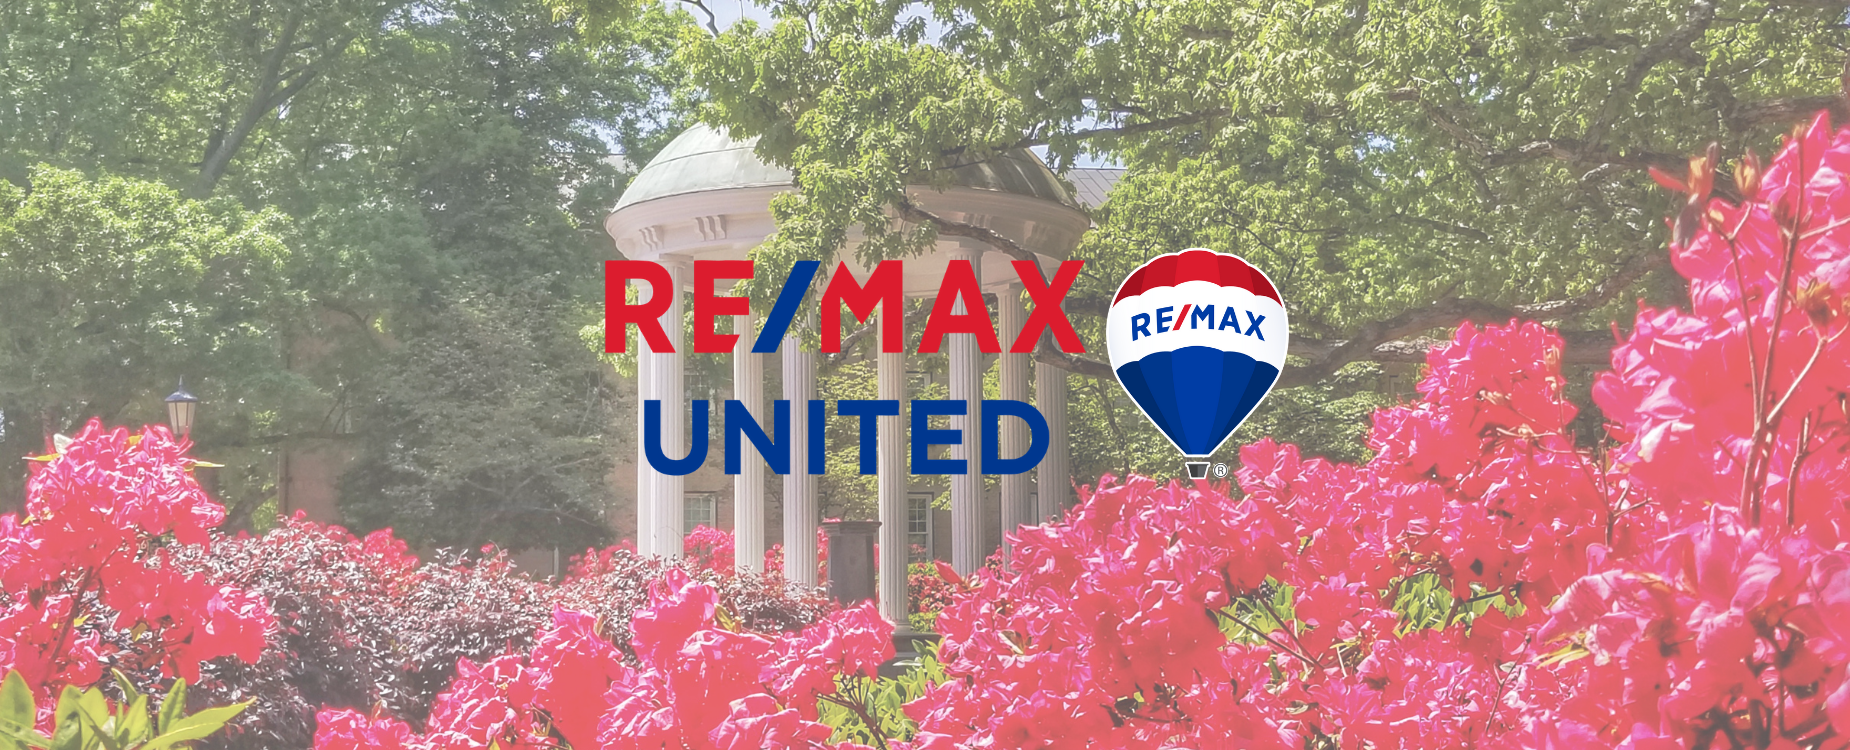 RE/MAX United Chapel Hill